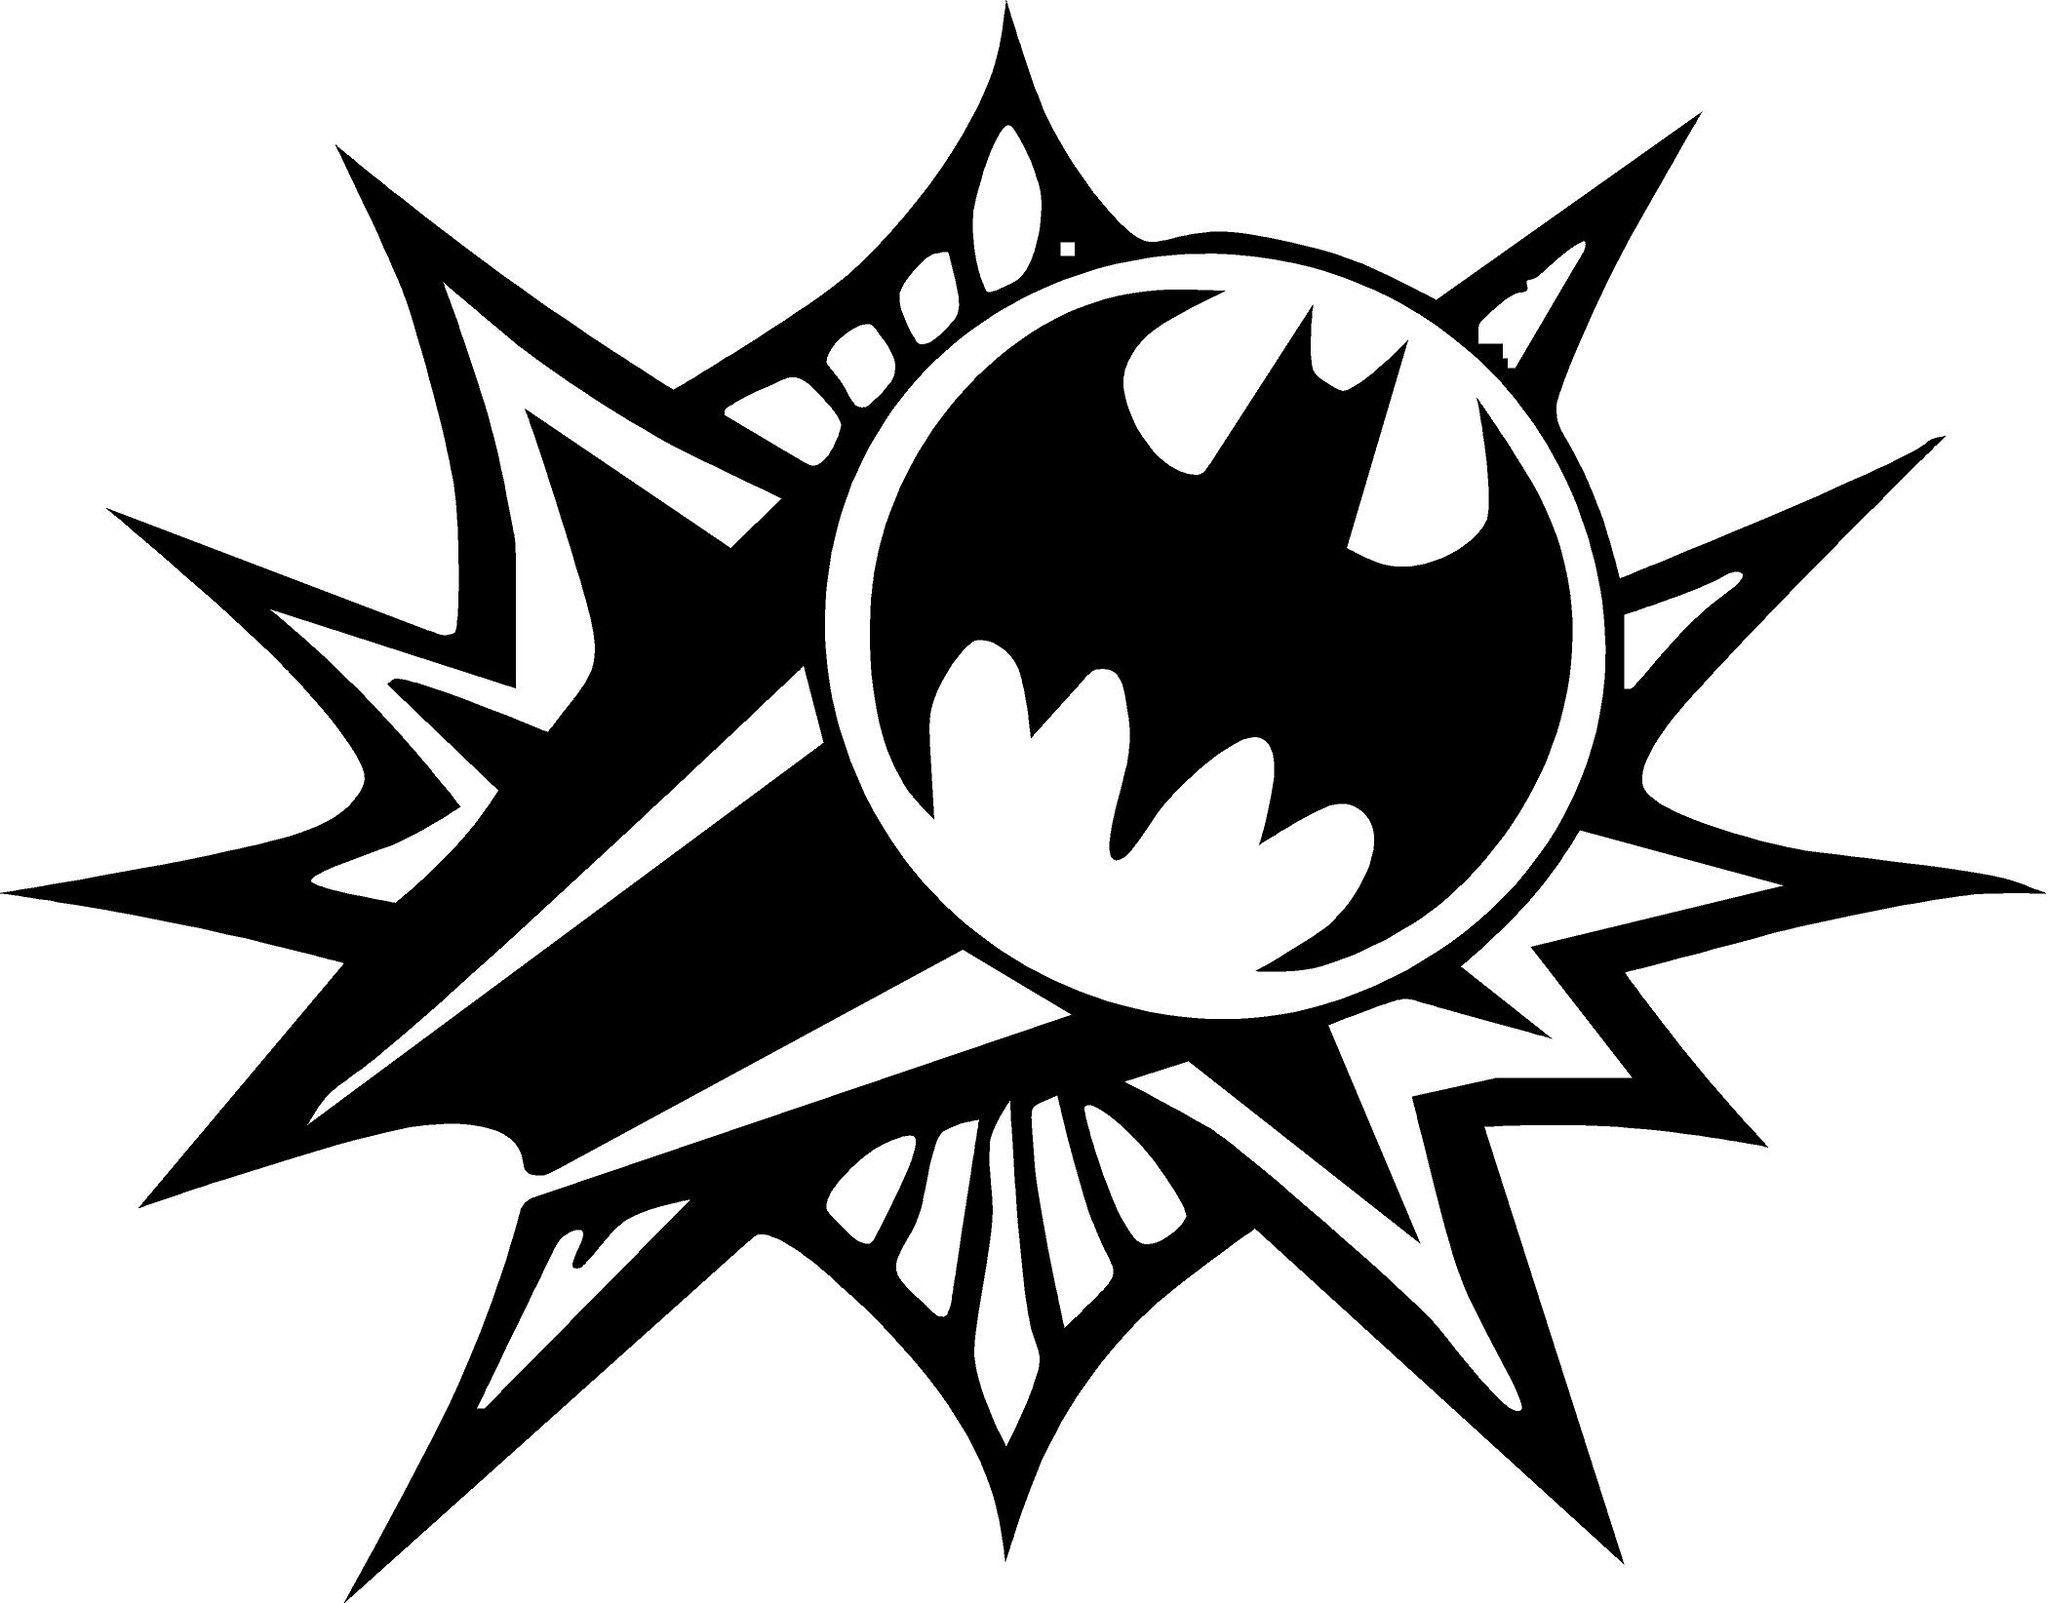 Batman Vinyl Decal measures approximately 7x5.5! Available